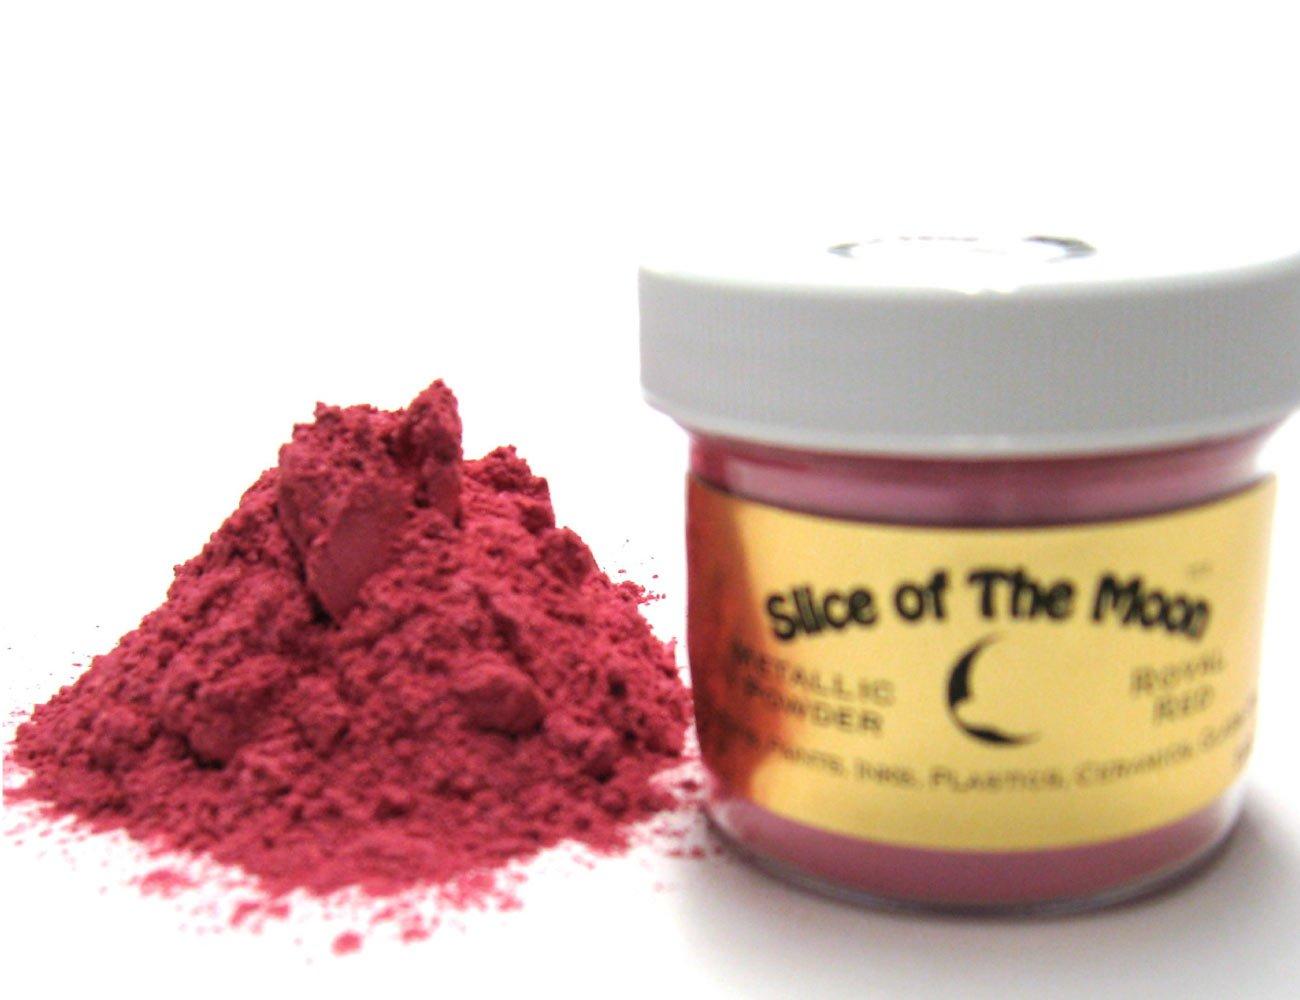 Rose Red Mica Powder 1oz, Metallic Pink Powder, Cosmetic Mica, Slice of the Moon